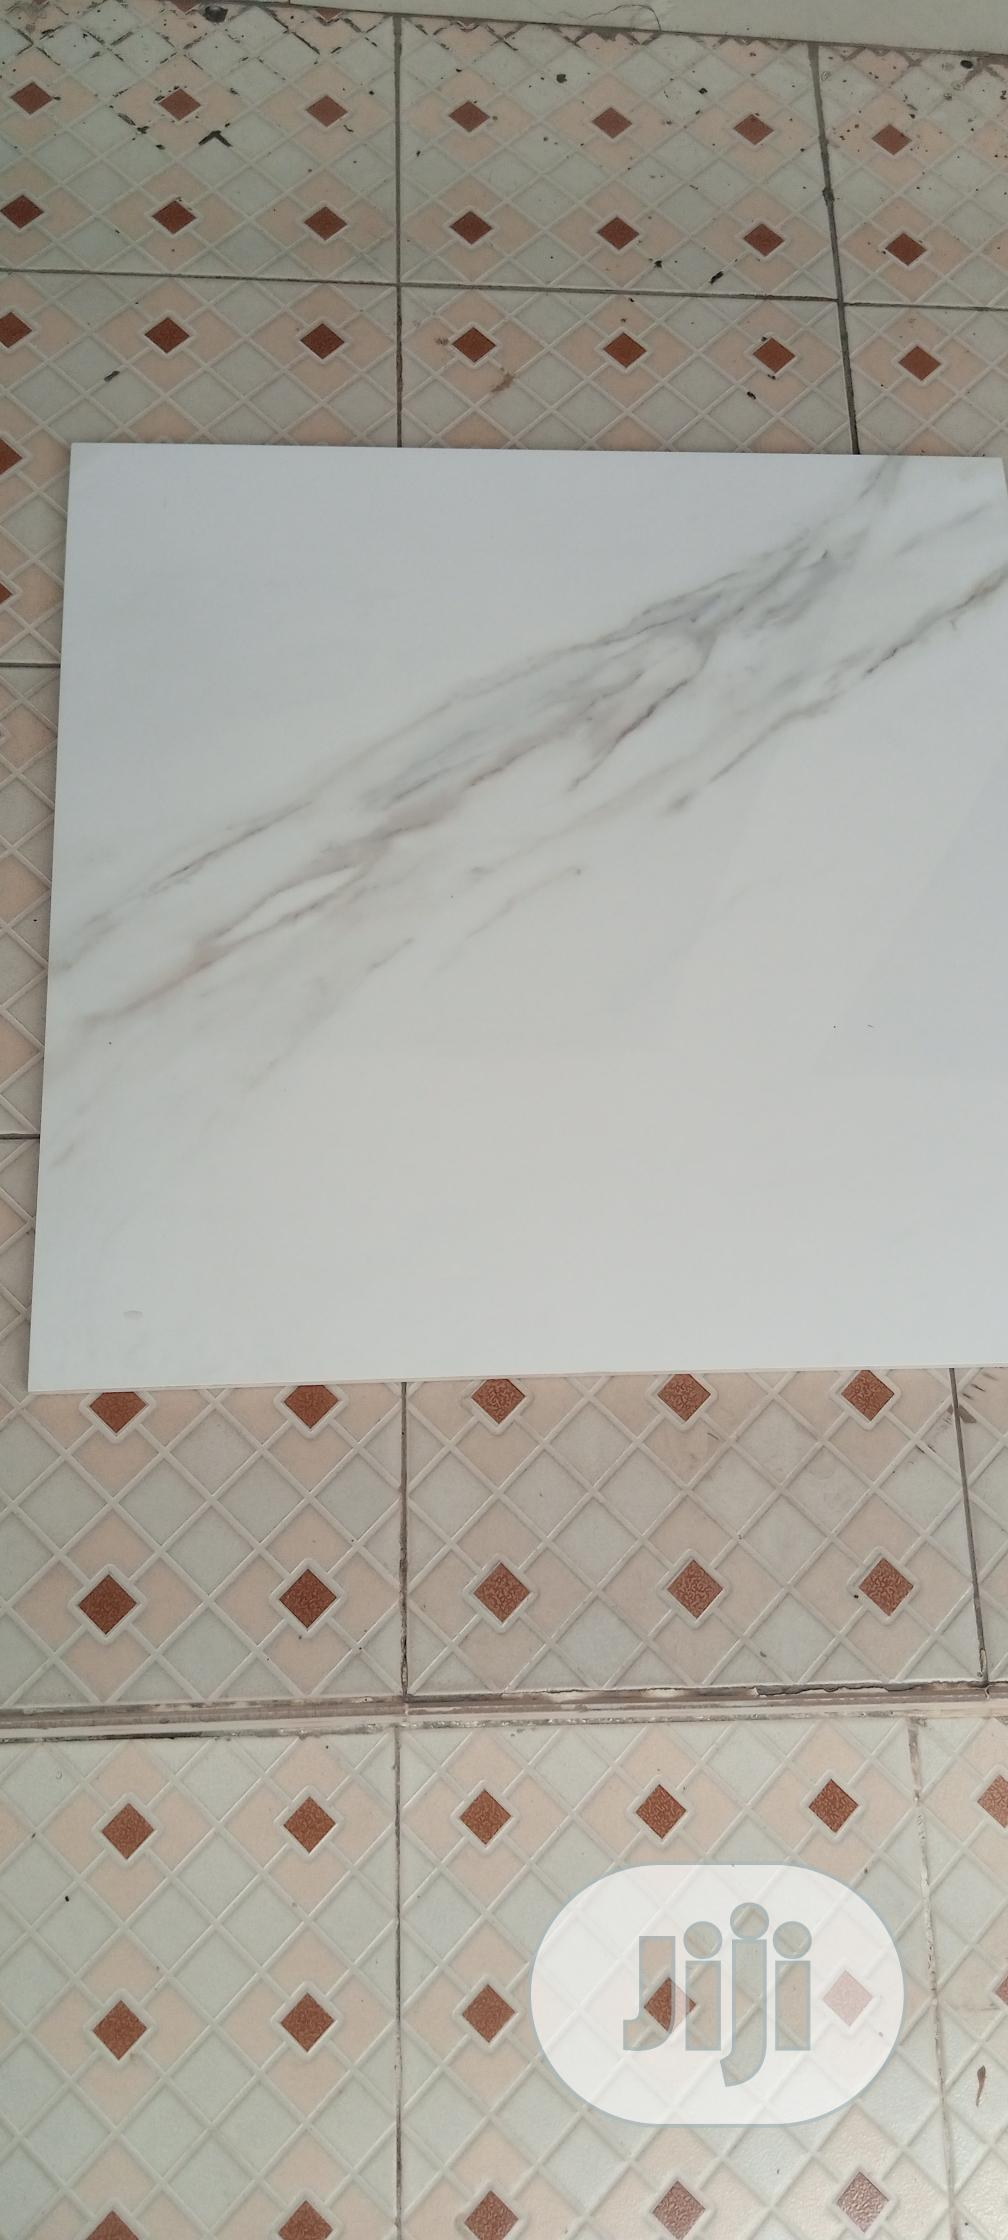 60×60cm Spanish Tiles | Building Materials for sale in Ajah, Lagos State, Nigeria